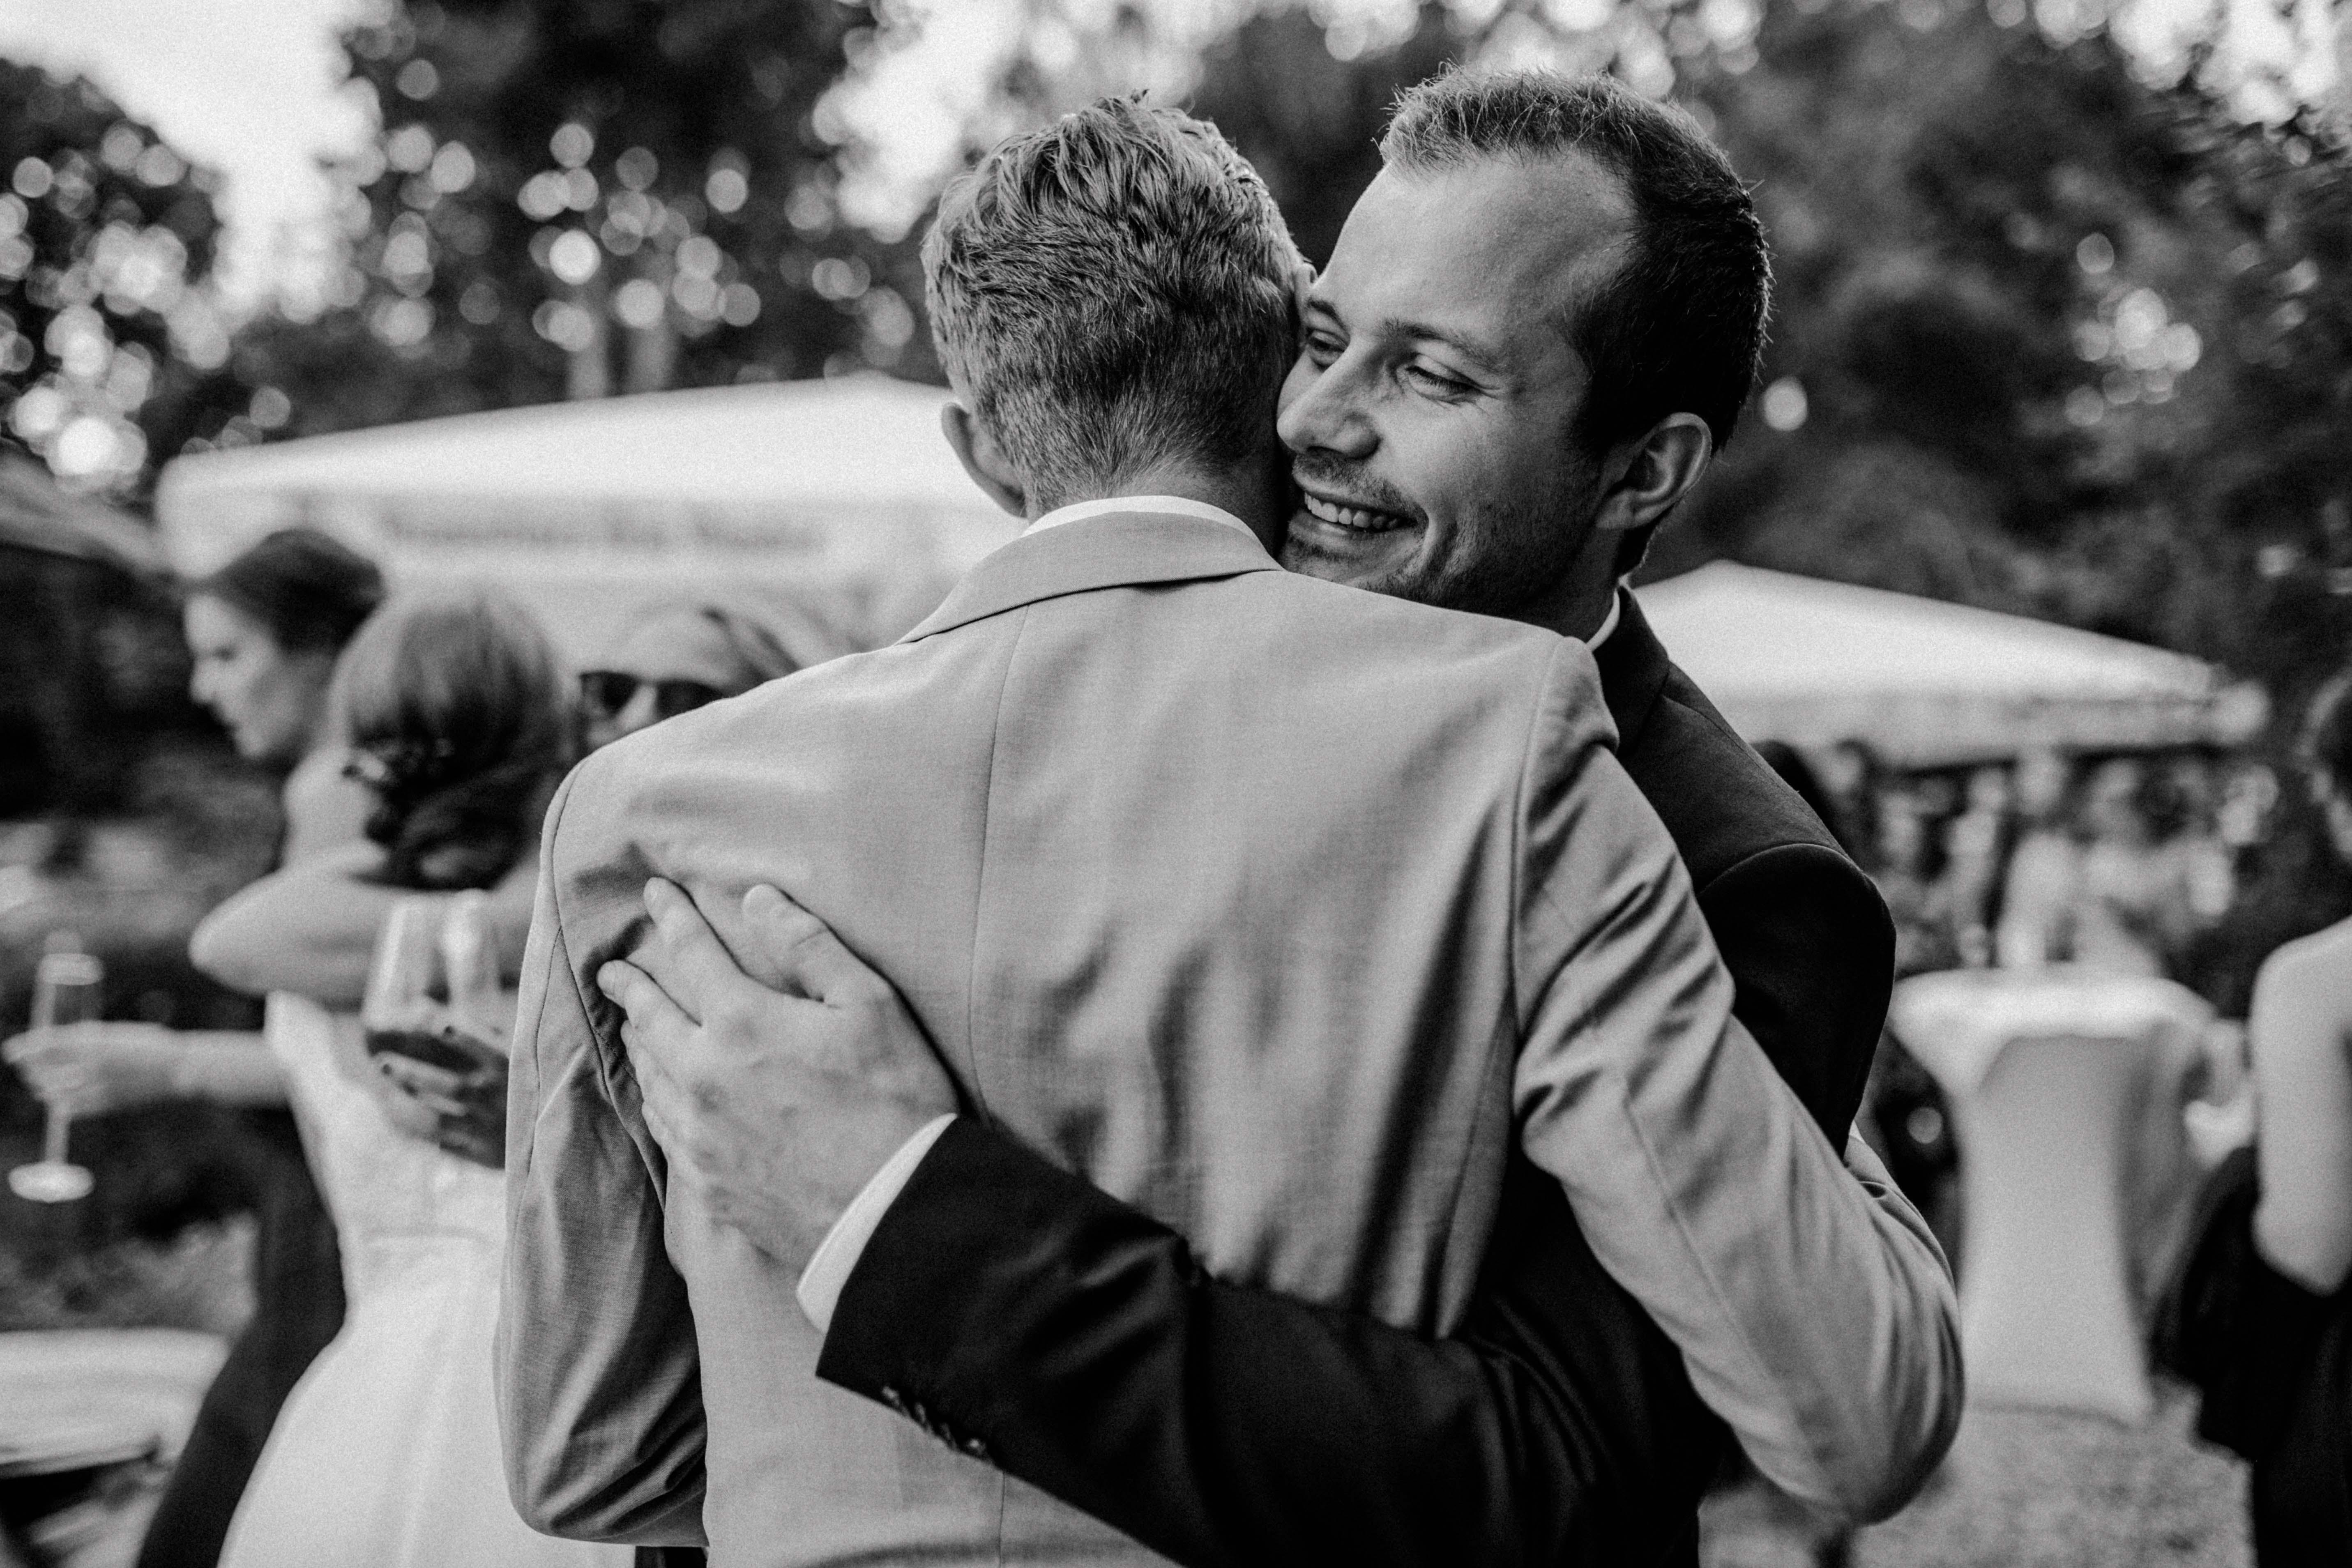 schwager sonja poehlmann photography couples muenchen bayern